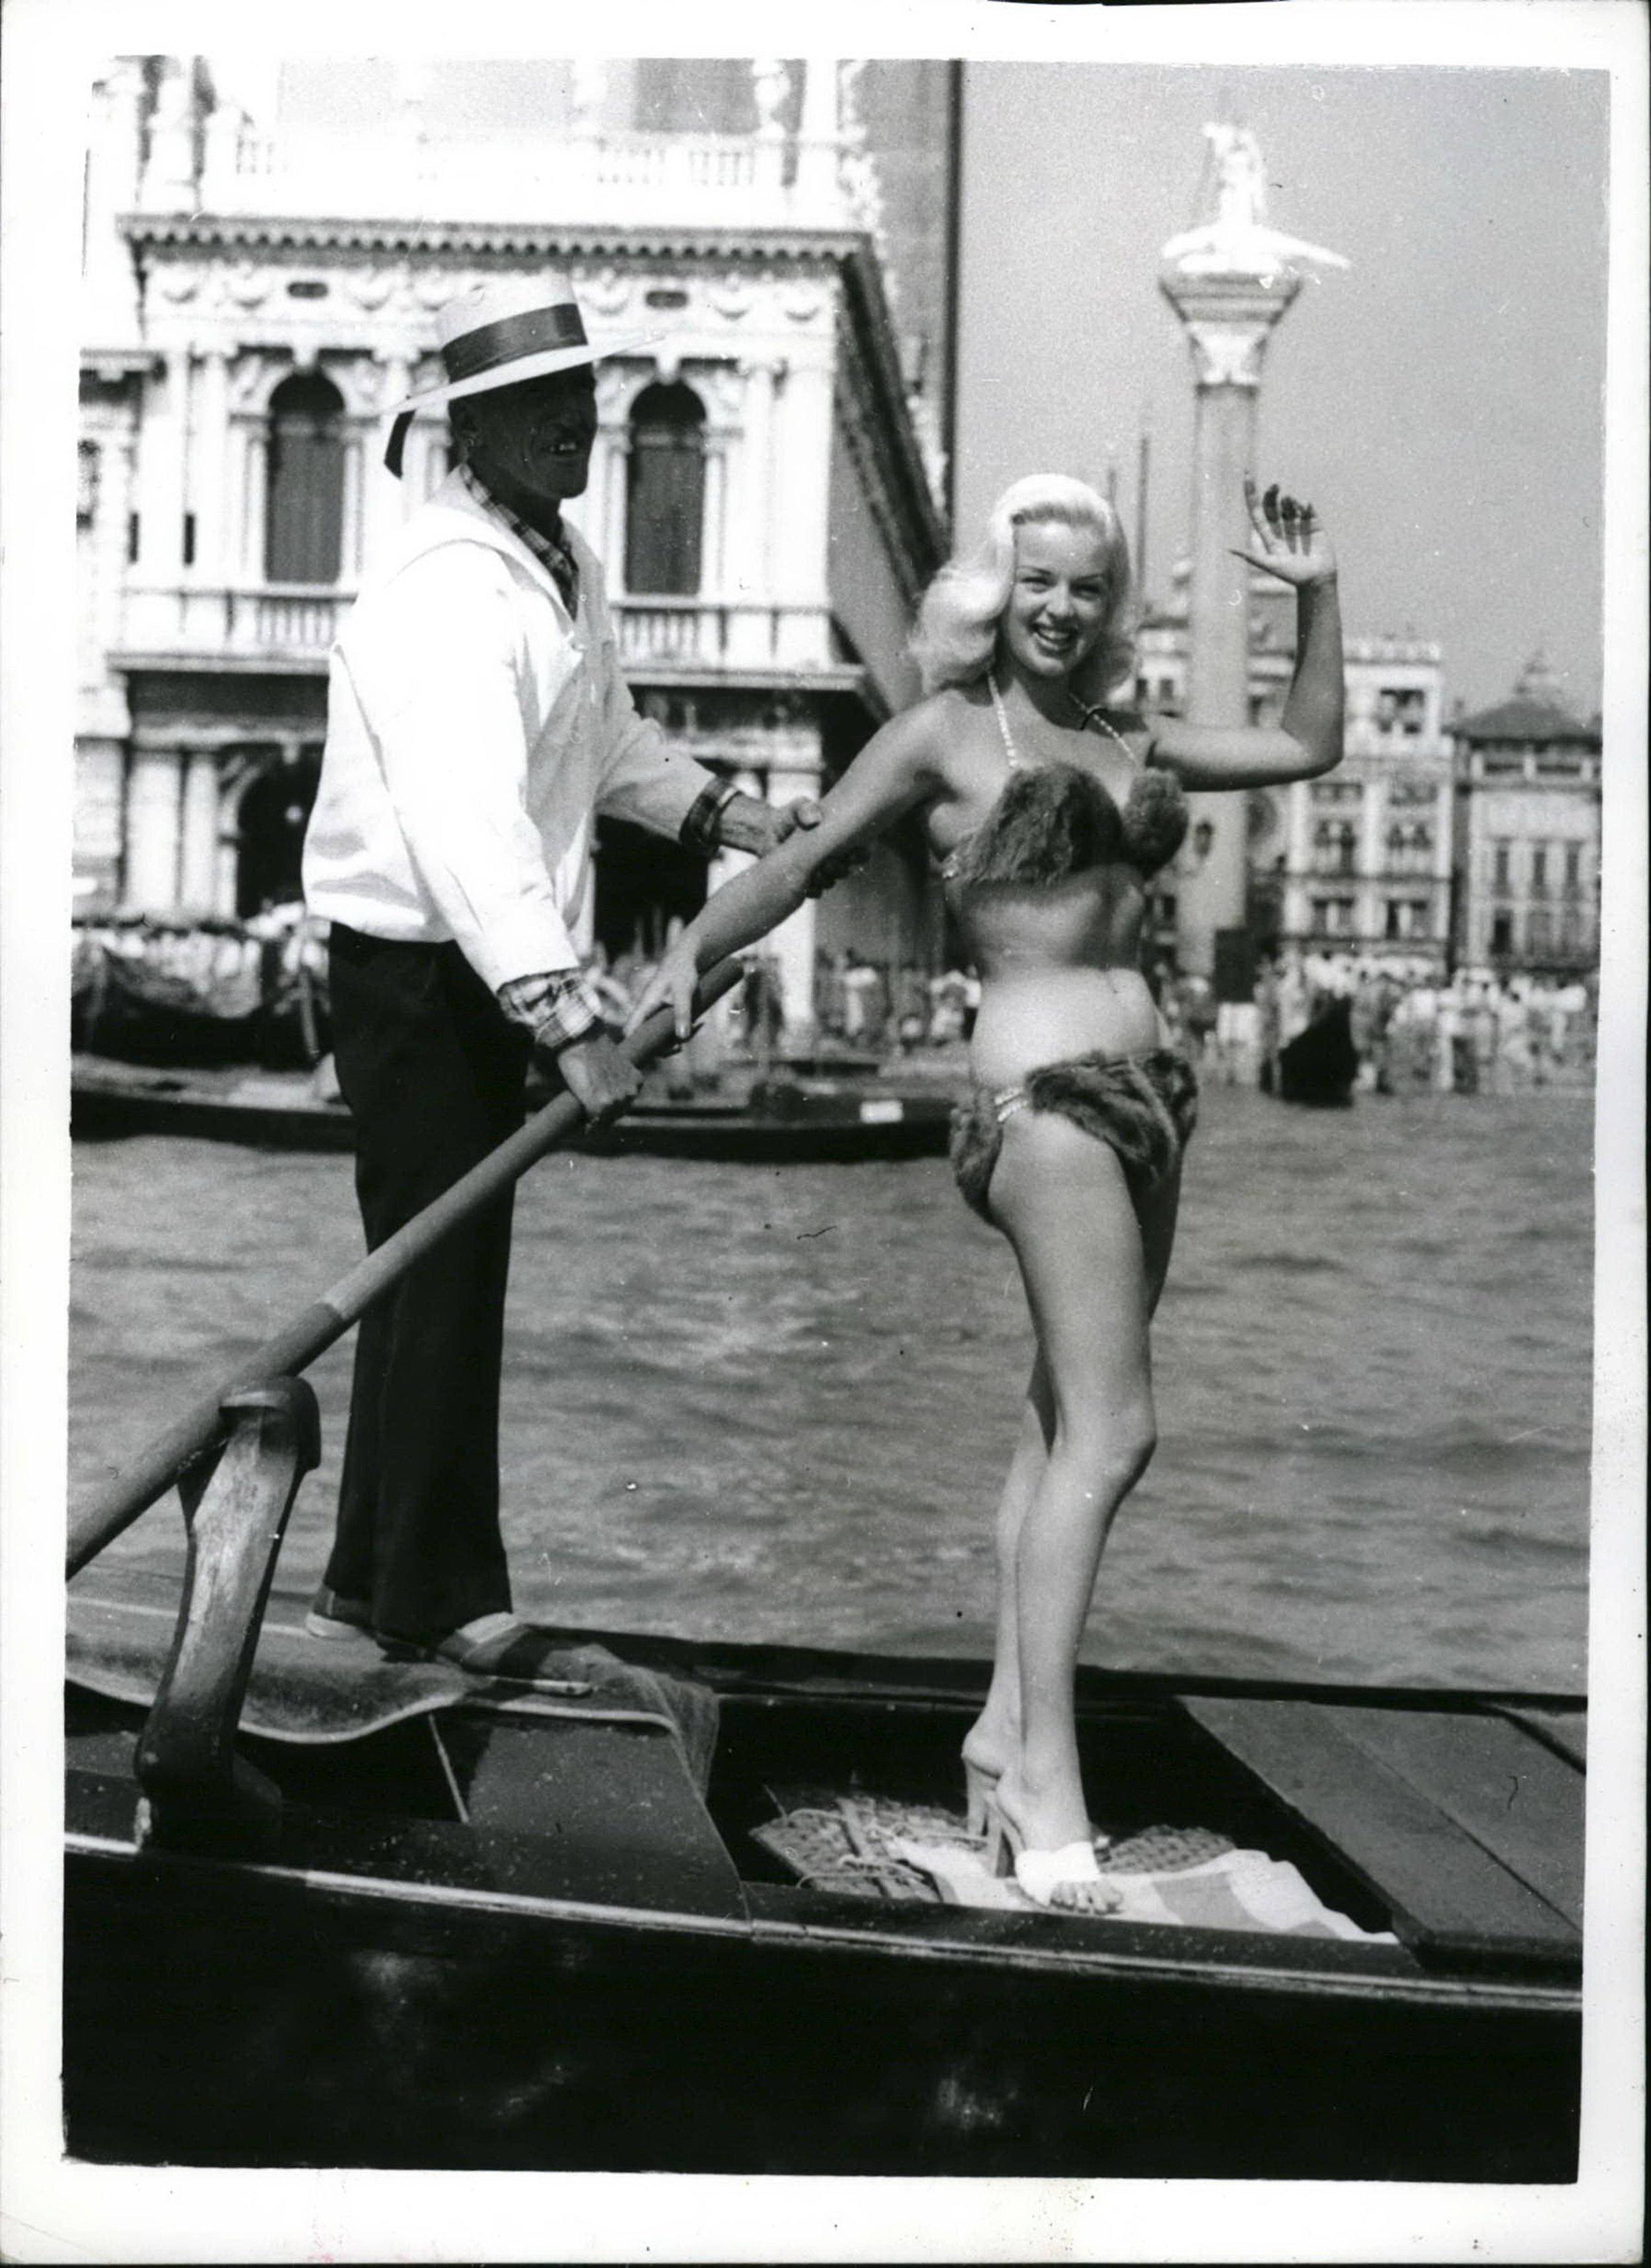 Diana Dors in her mink bikini - not terribly practical!